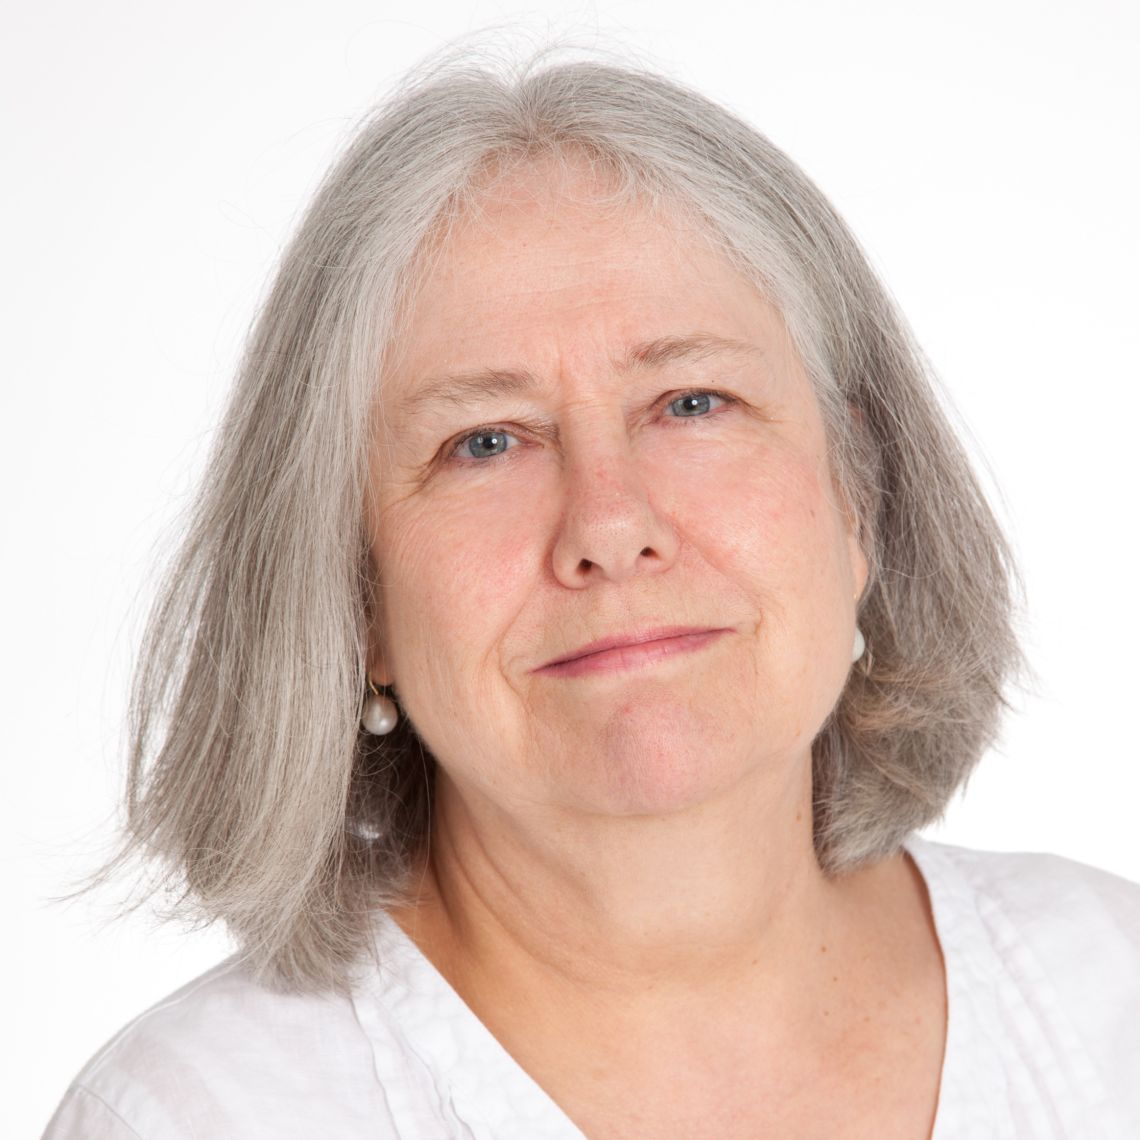 Professor Kate Venables